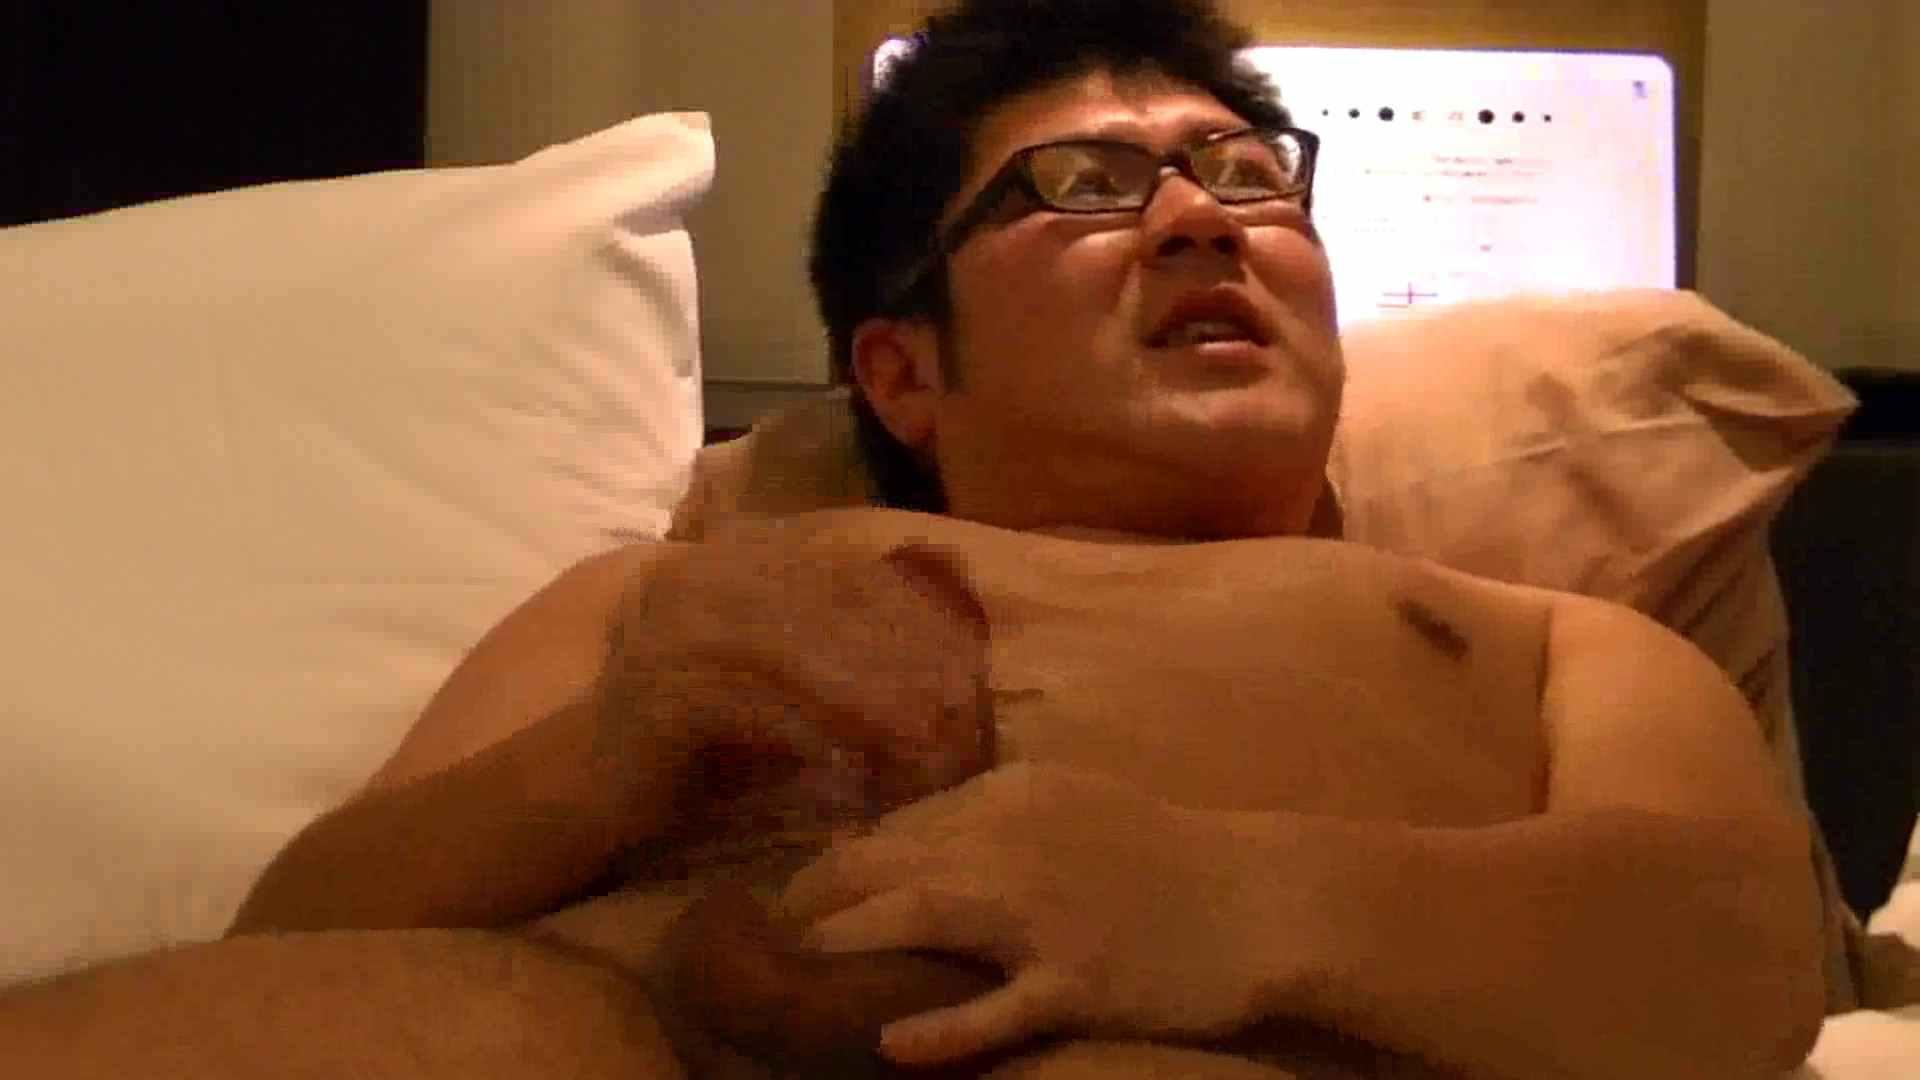 ONA見せカーニバル!! Vol5 エッチ ゲイ無修正ビデオ画像 108枚 105